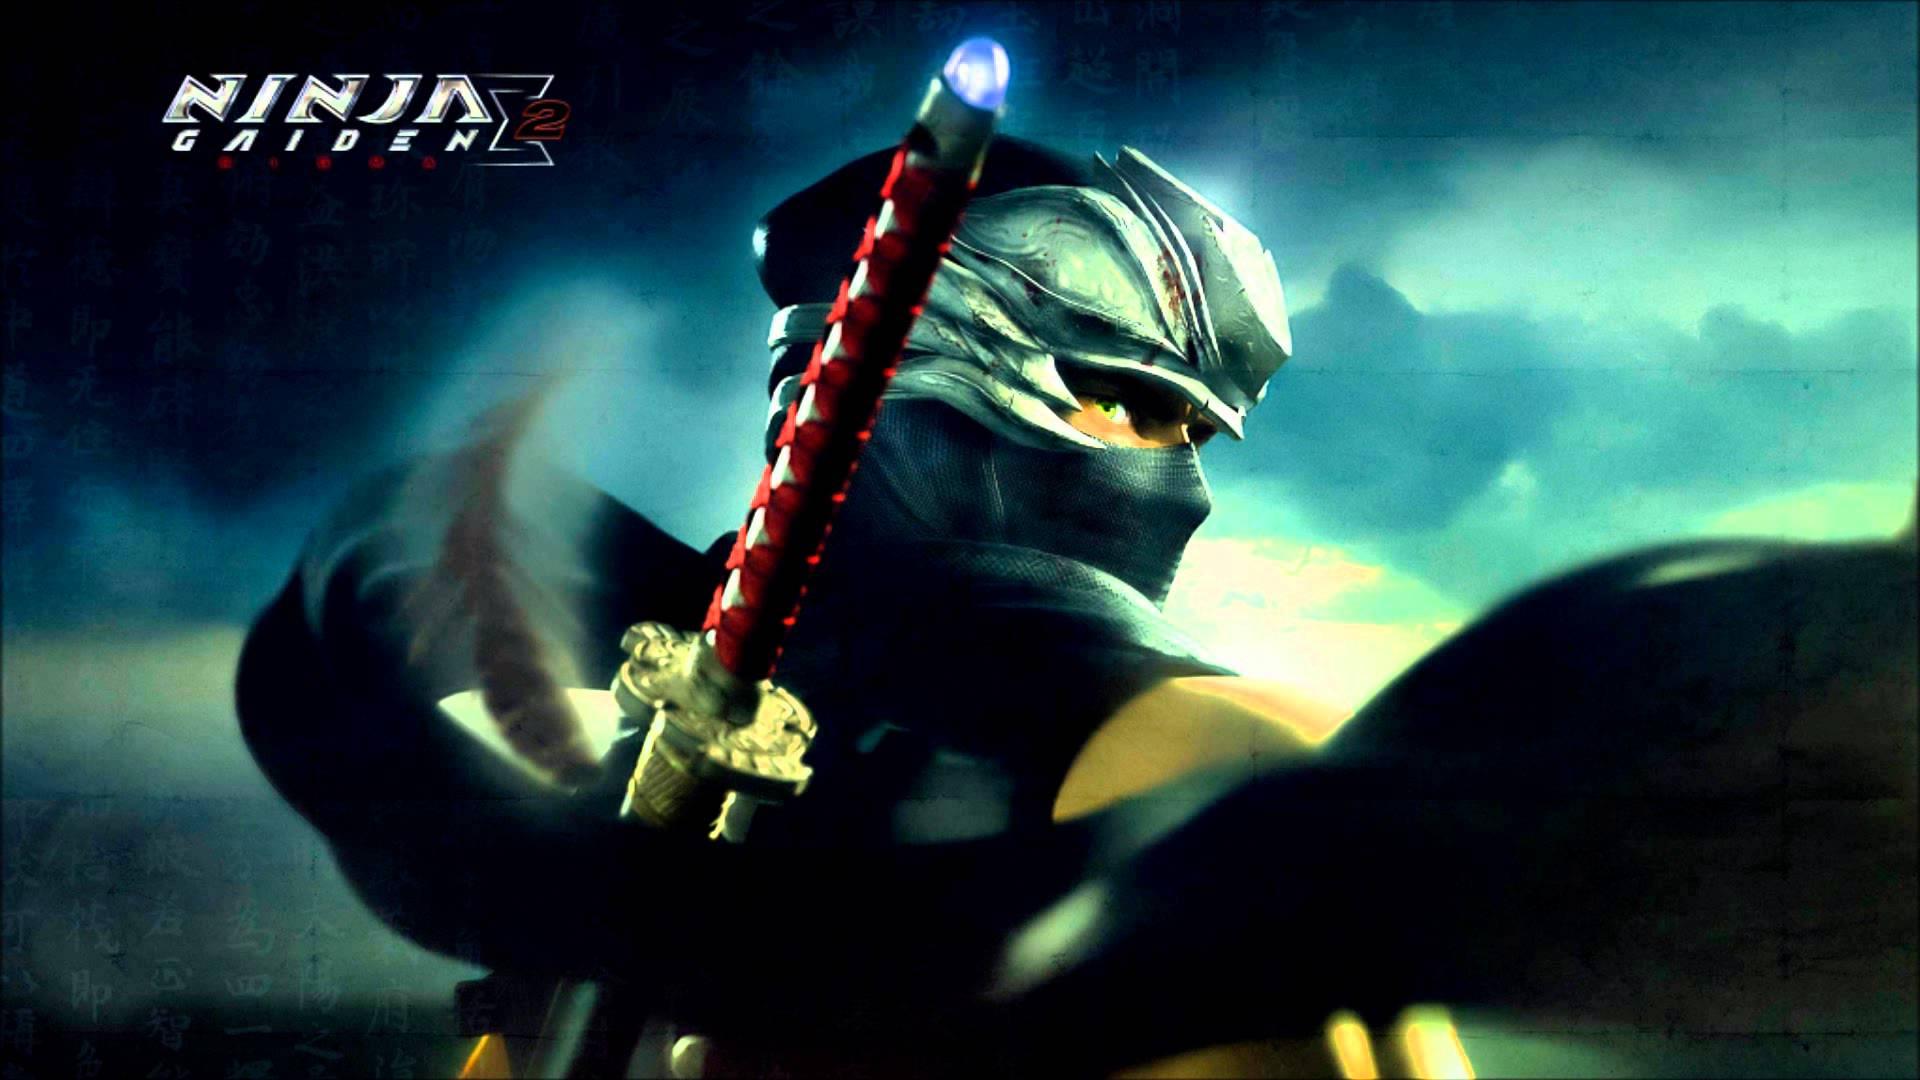 Ninja Gaiden Sigma 2 Wallpapers Top Free Ninja Gaiden Sigma 2 Backgrounds Wallpaperaccess